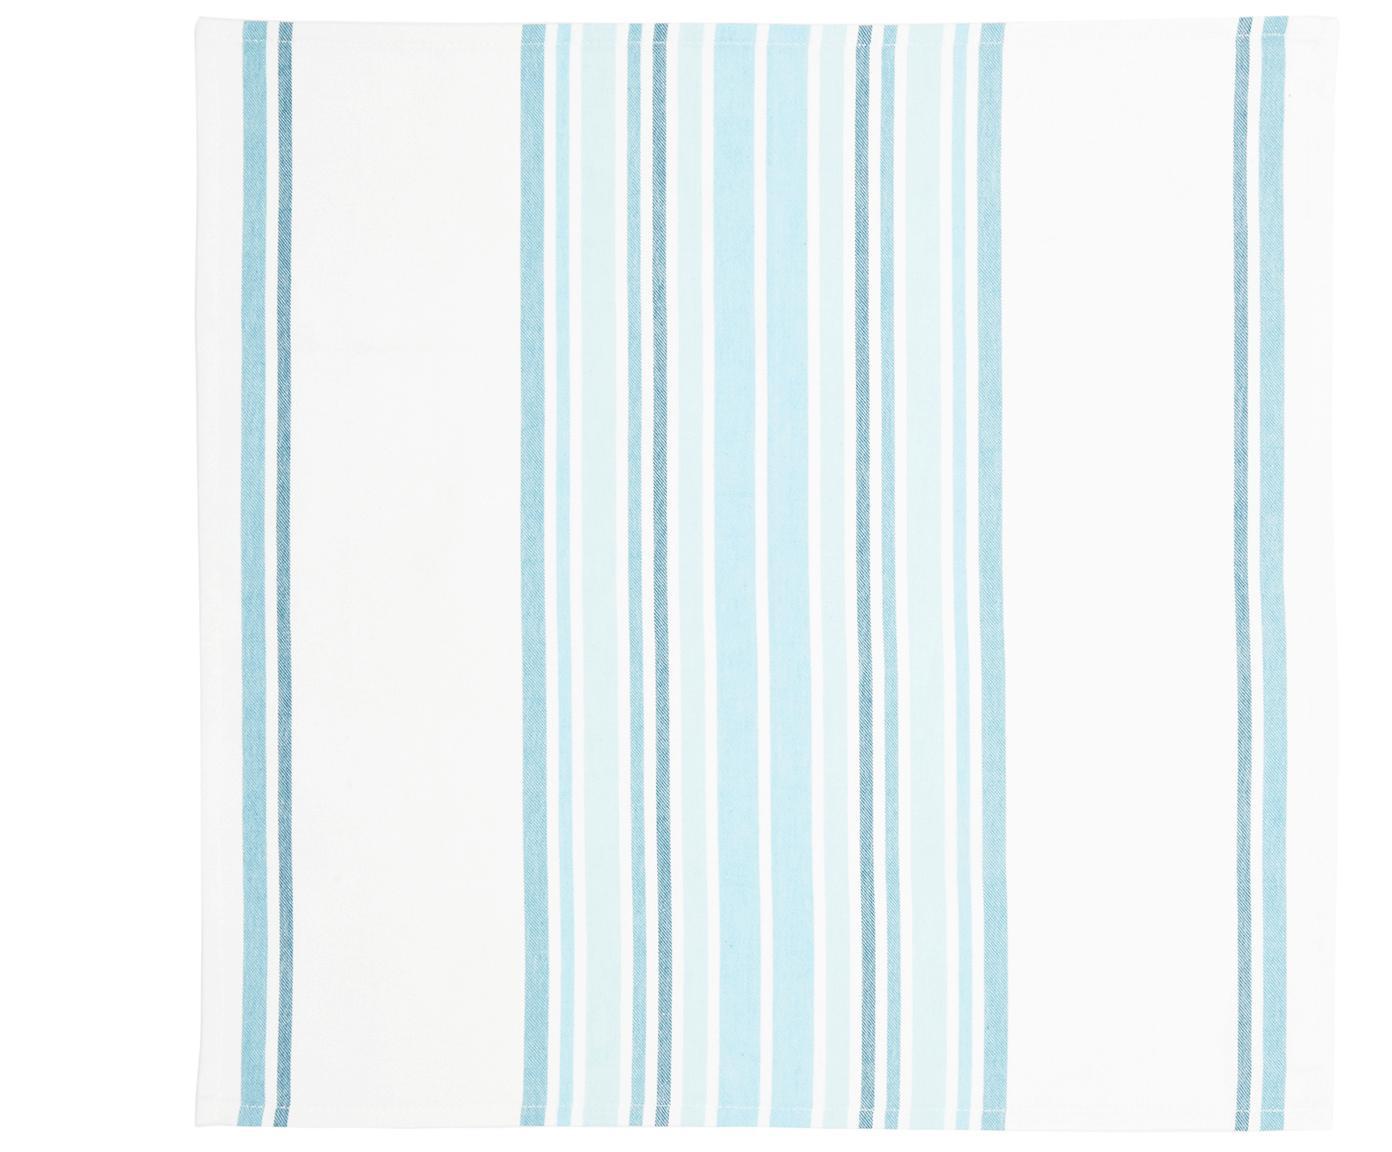 Stoffen servetten Katie, 2 stuks, Katoen, Wit, blauw, 50 x 50 cm